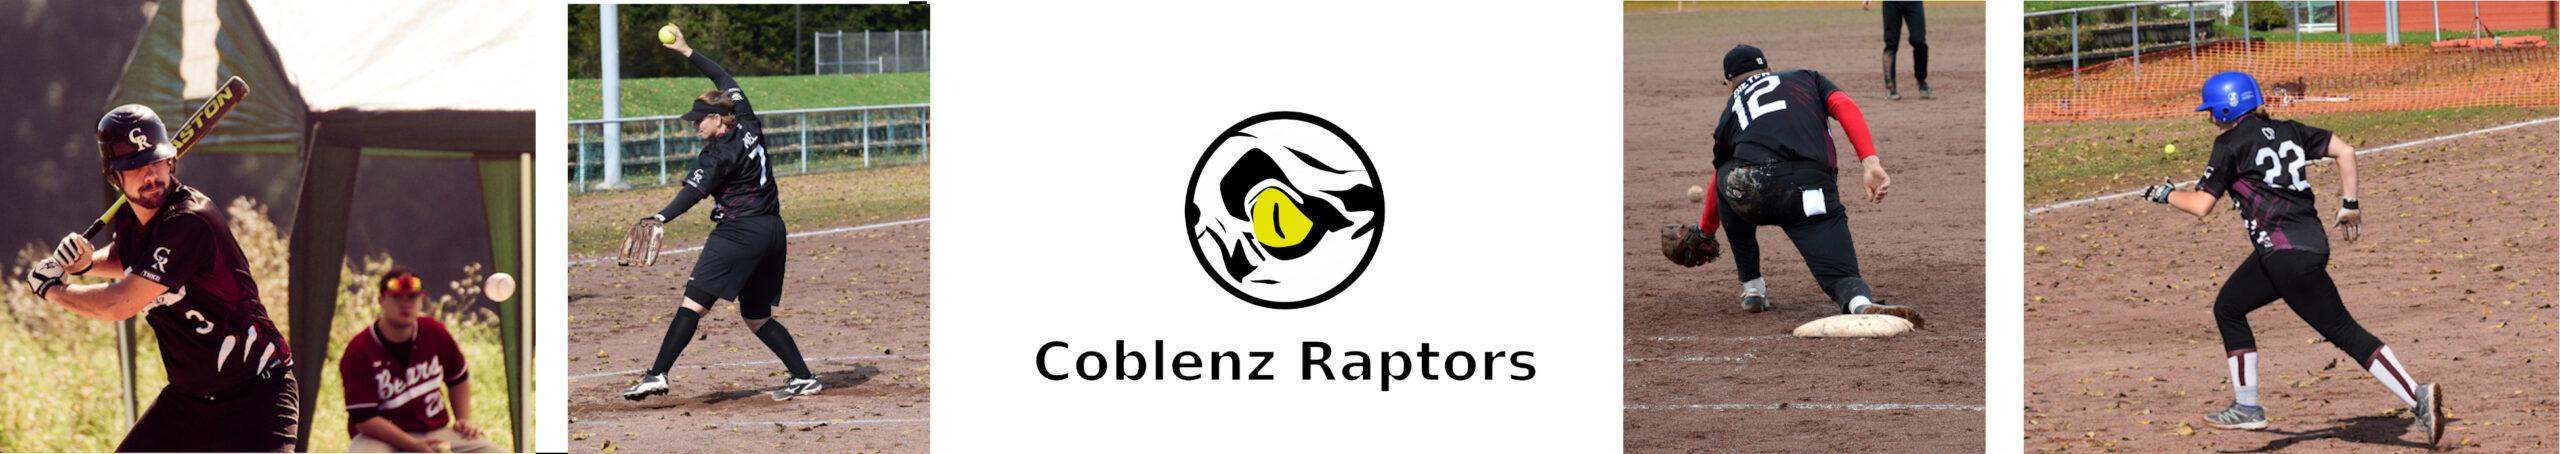 Coblenz Raptors - Baseball und Softball in Koblenz